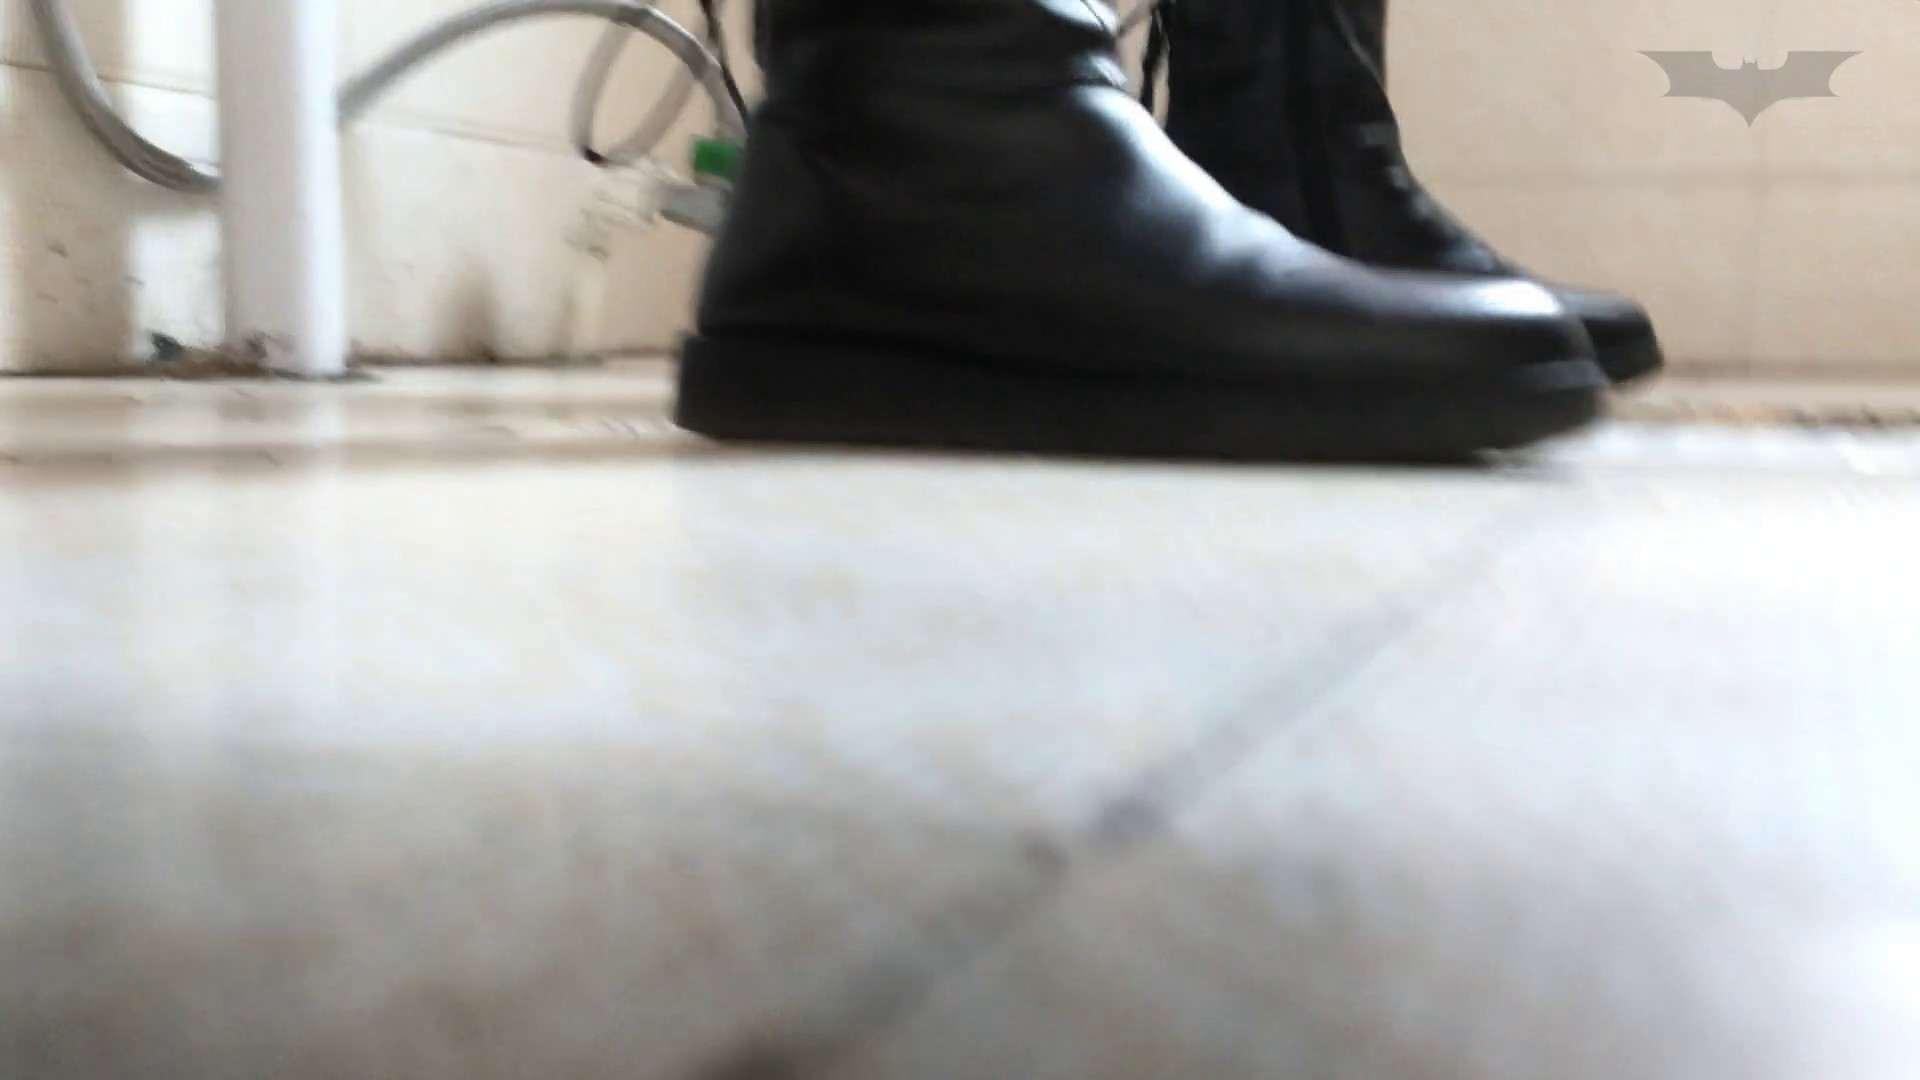 芸術大学ガチ潜入盗撮 JD盗撮 美女の洗面所の秘密 Vol.109 美肌 オメコ無修正動画無料 73画像 16